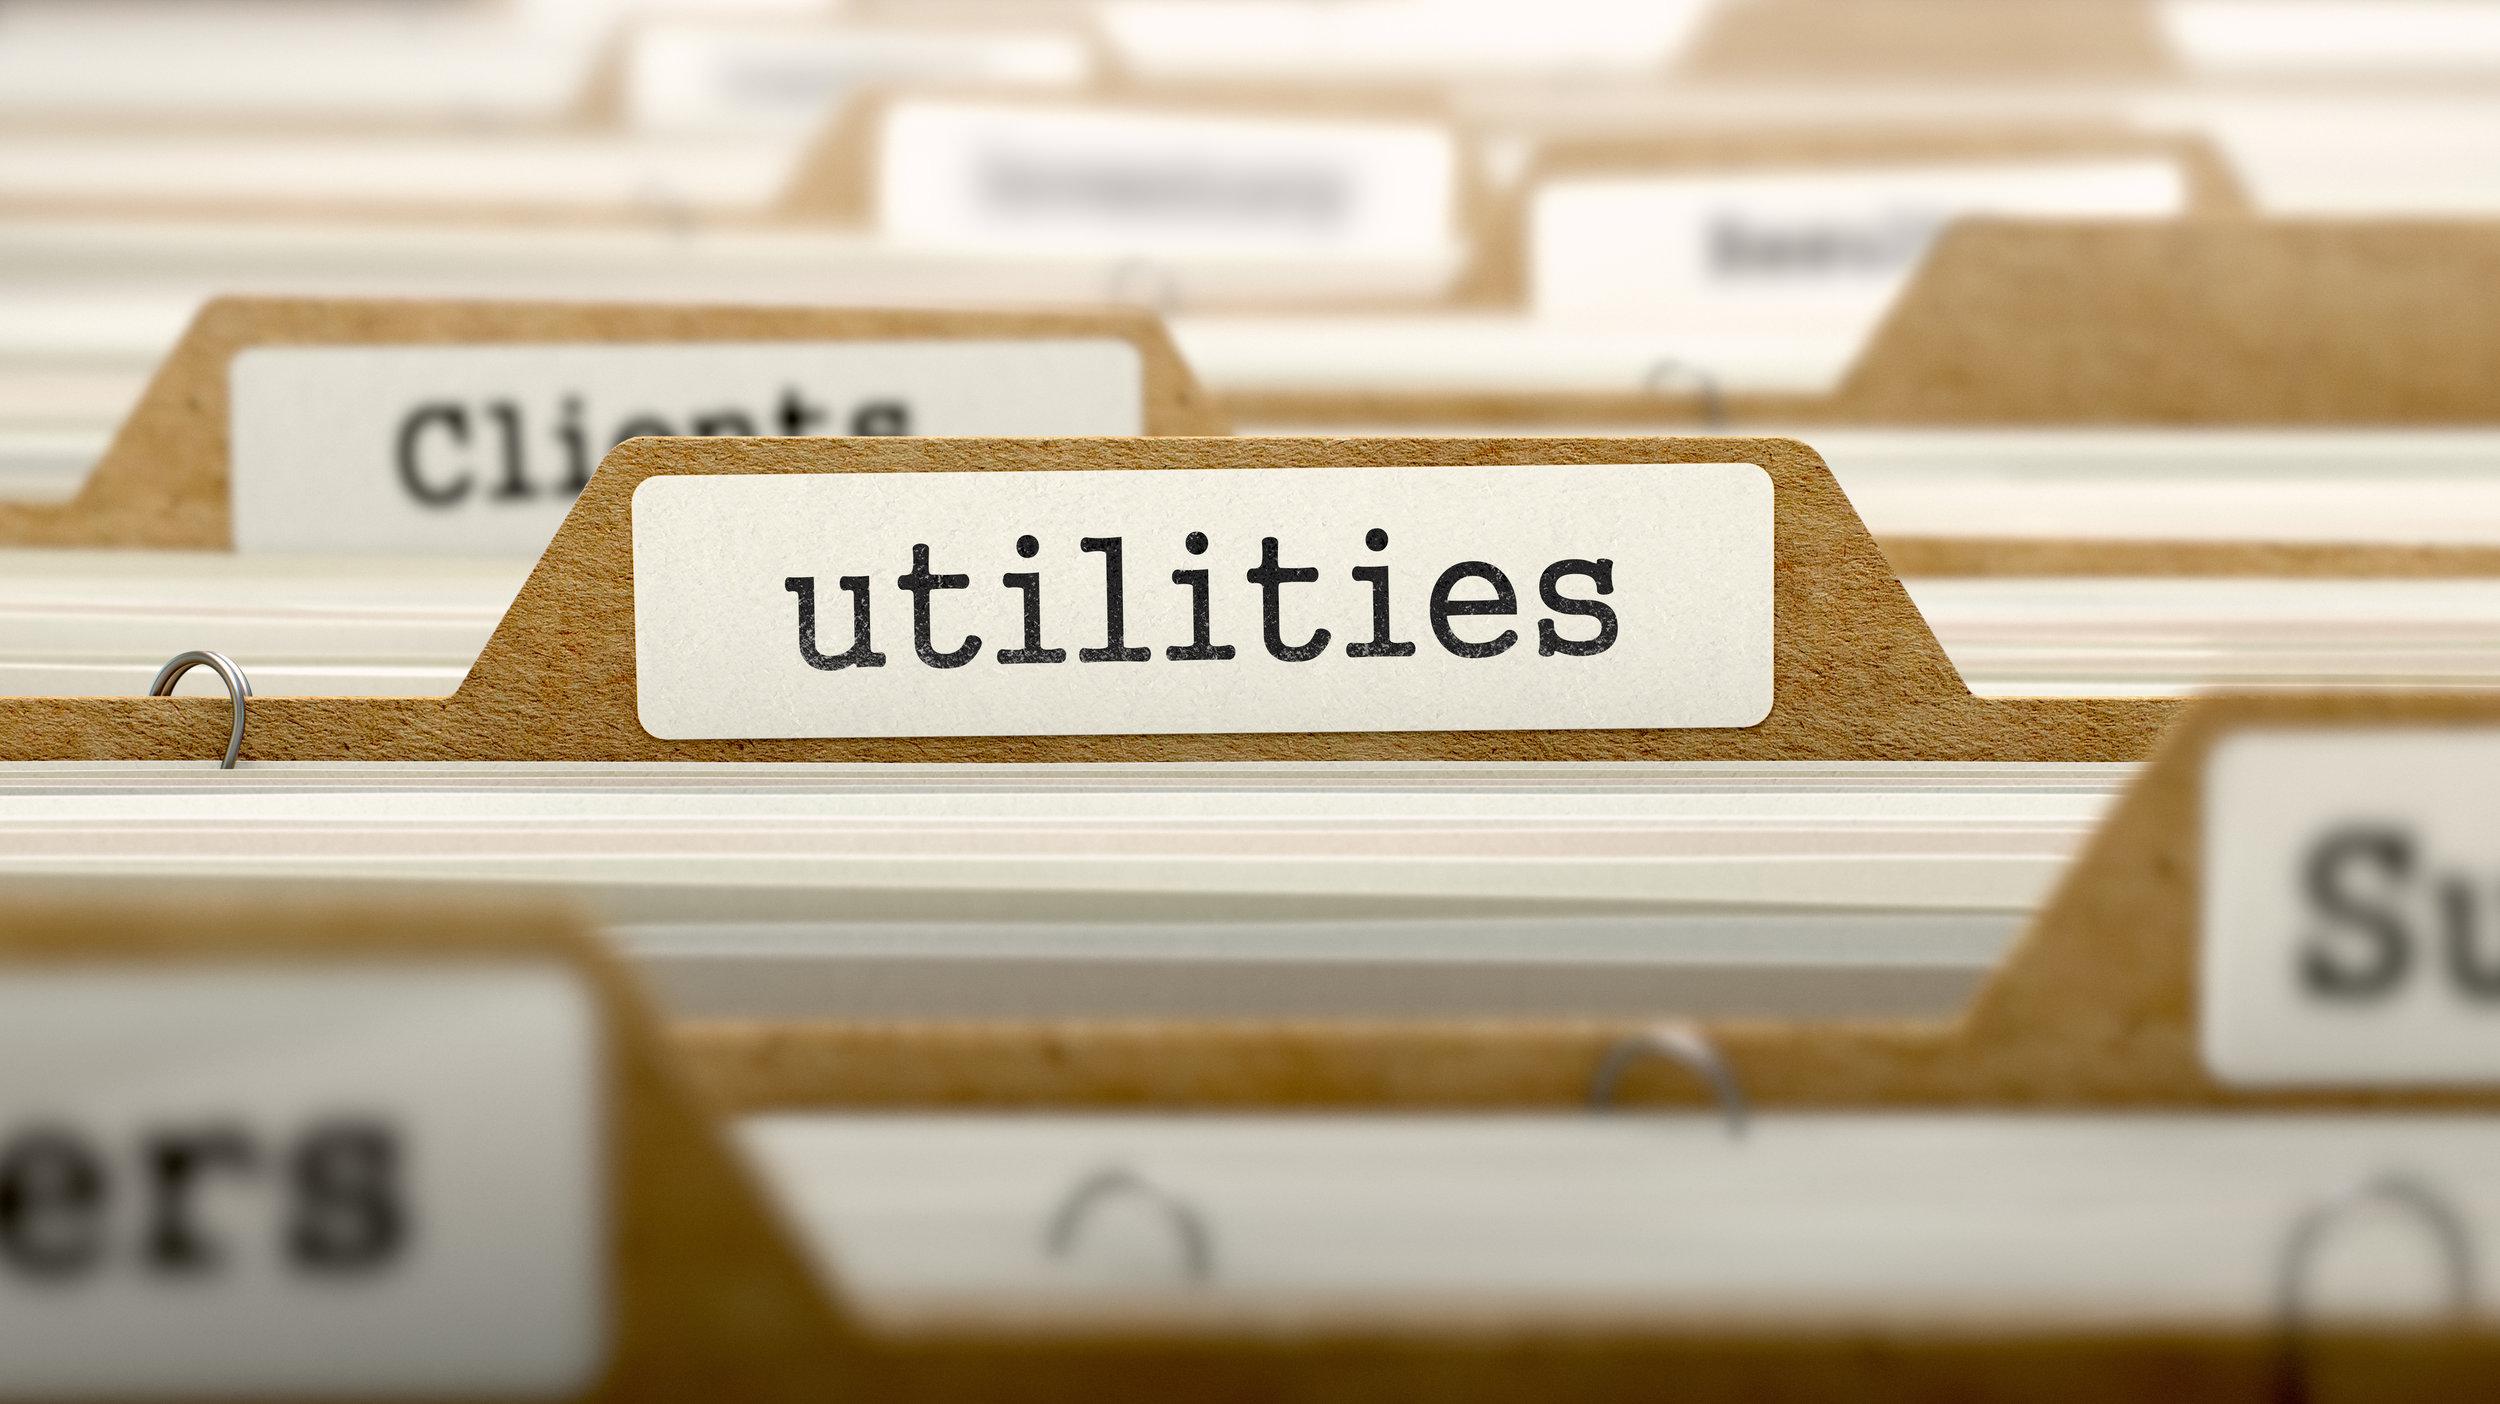 Filing Cabinet Utilities.jpeg